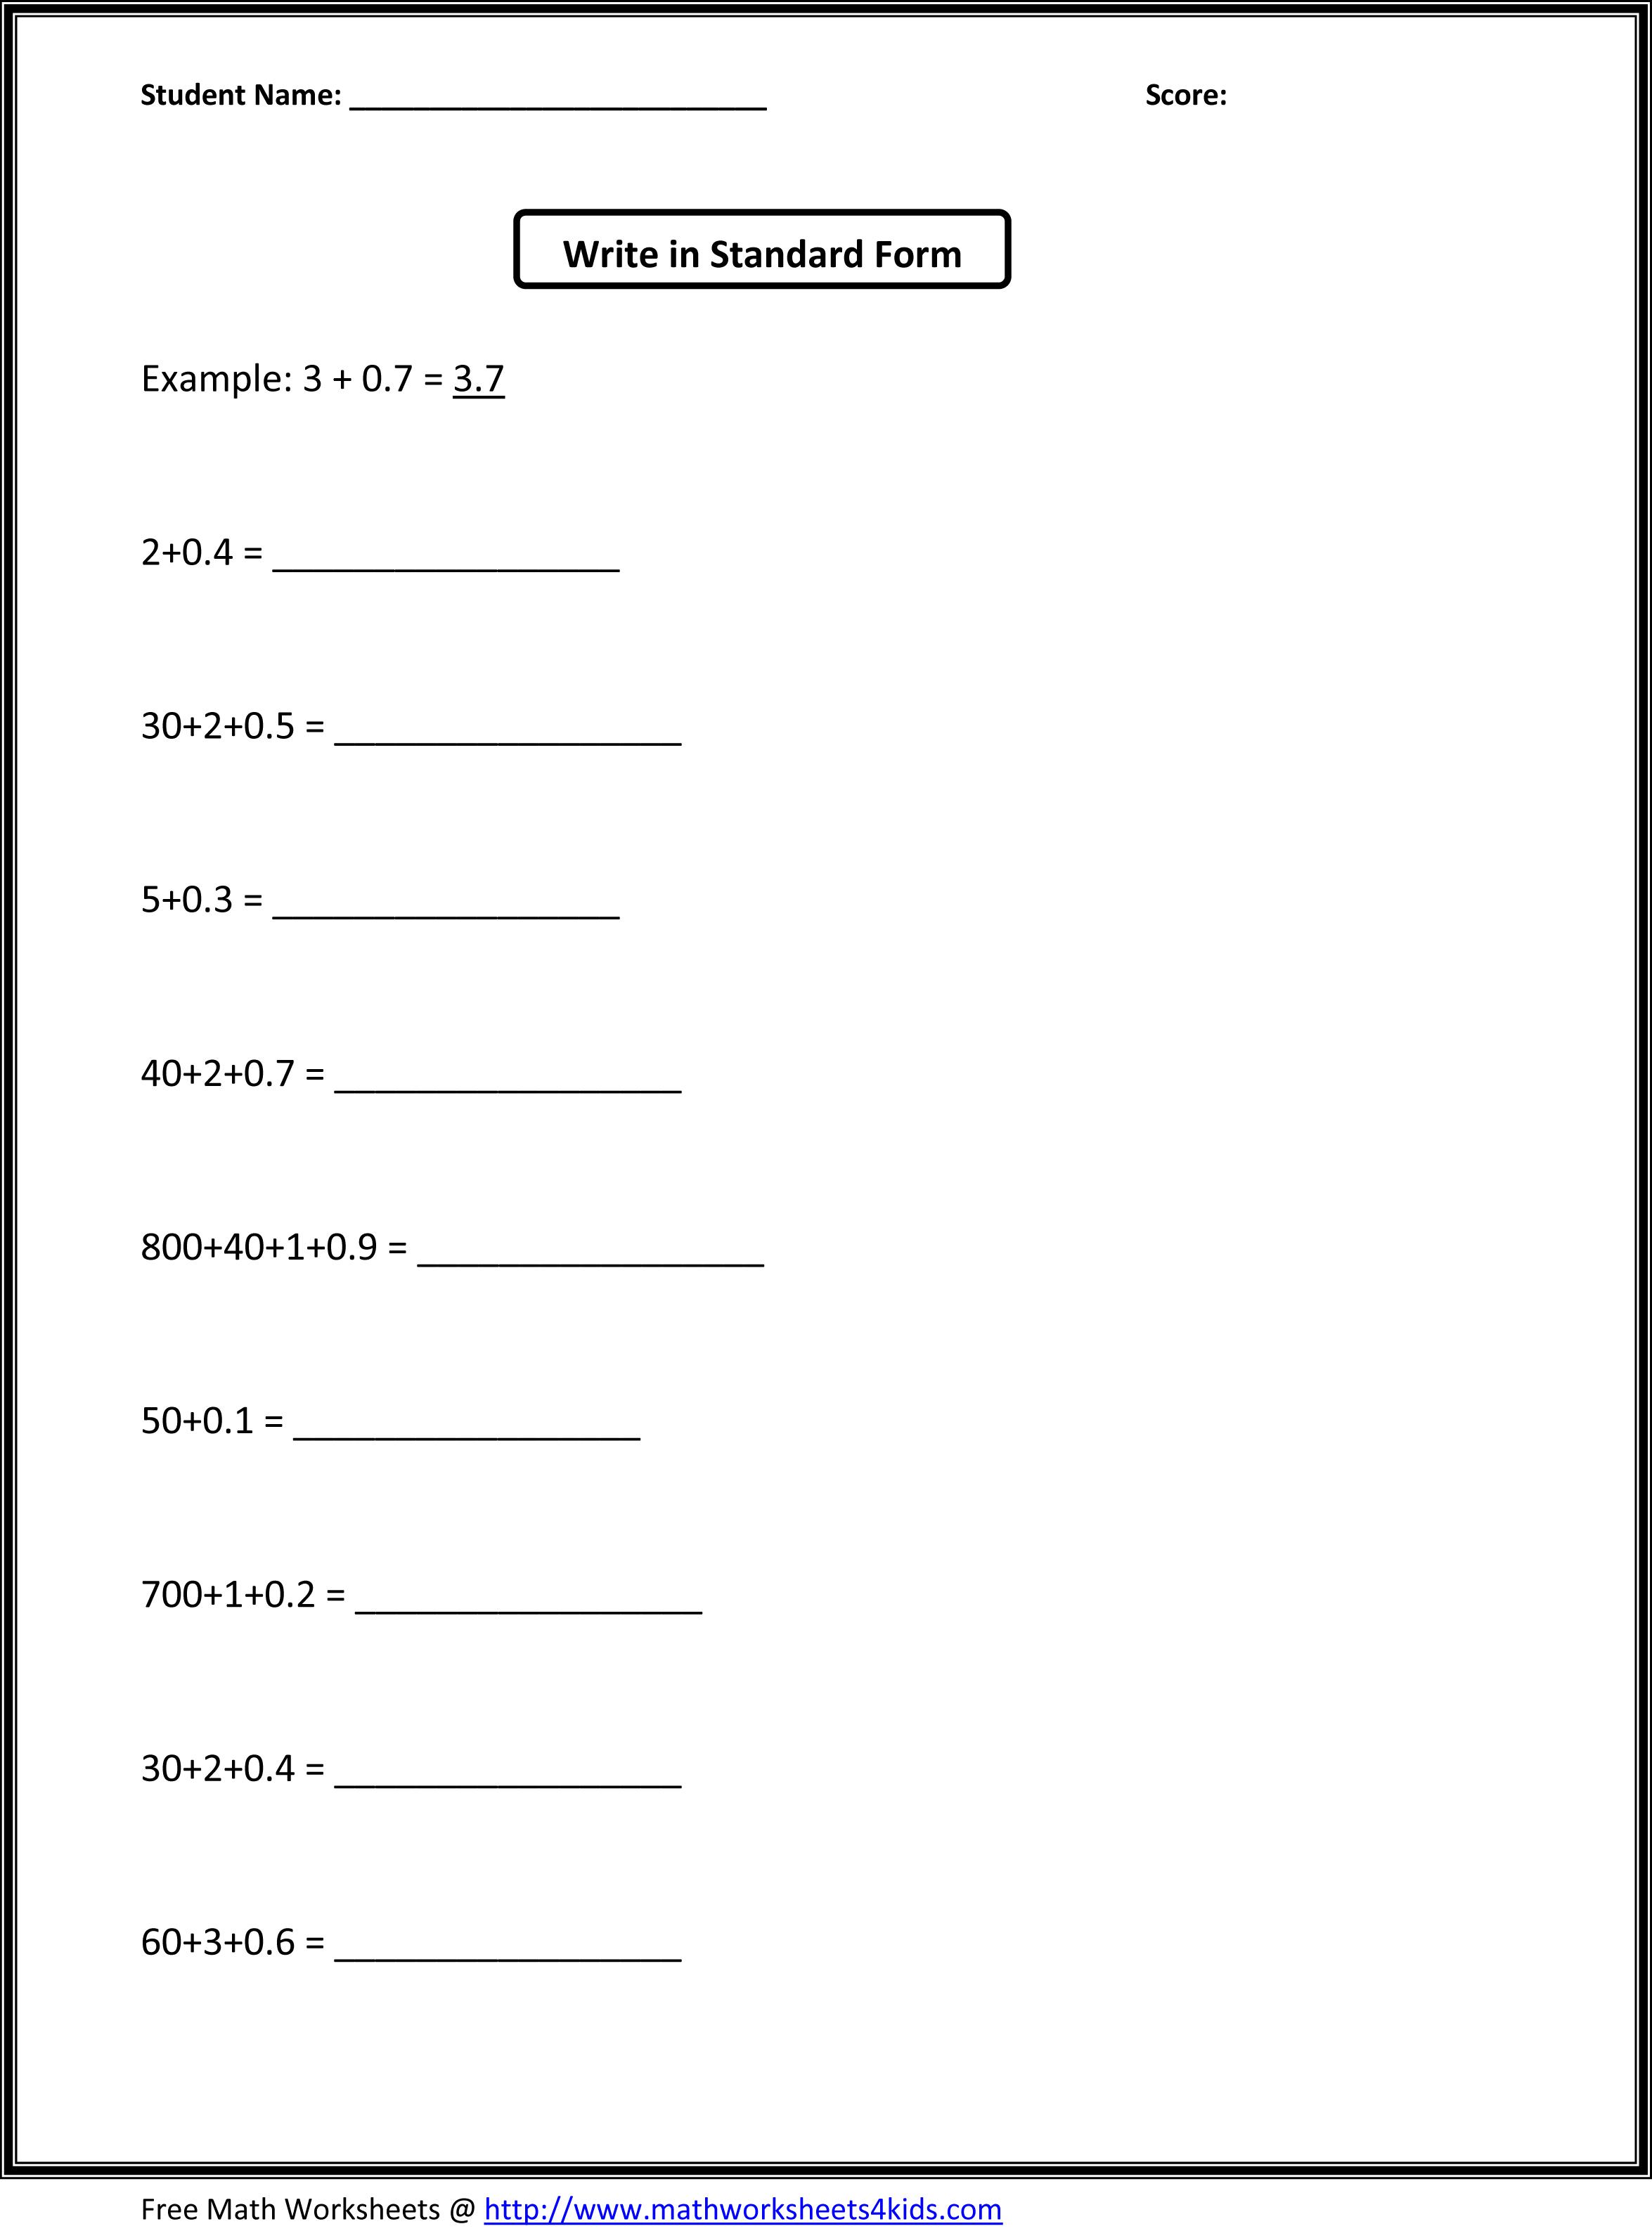 12 Best Images Of Basic High School Math Worksheets